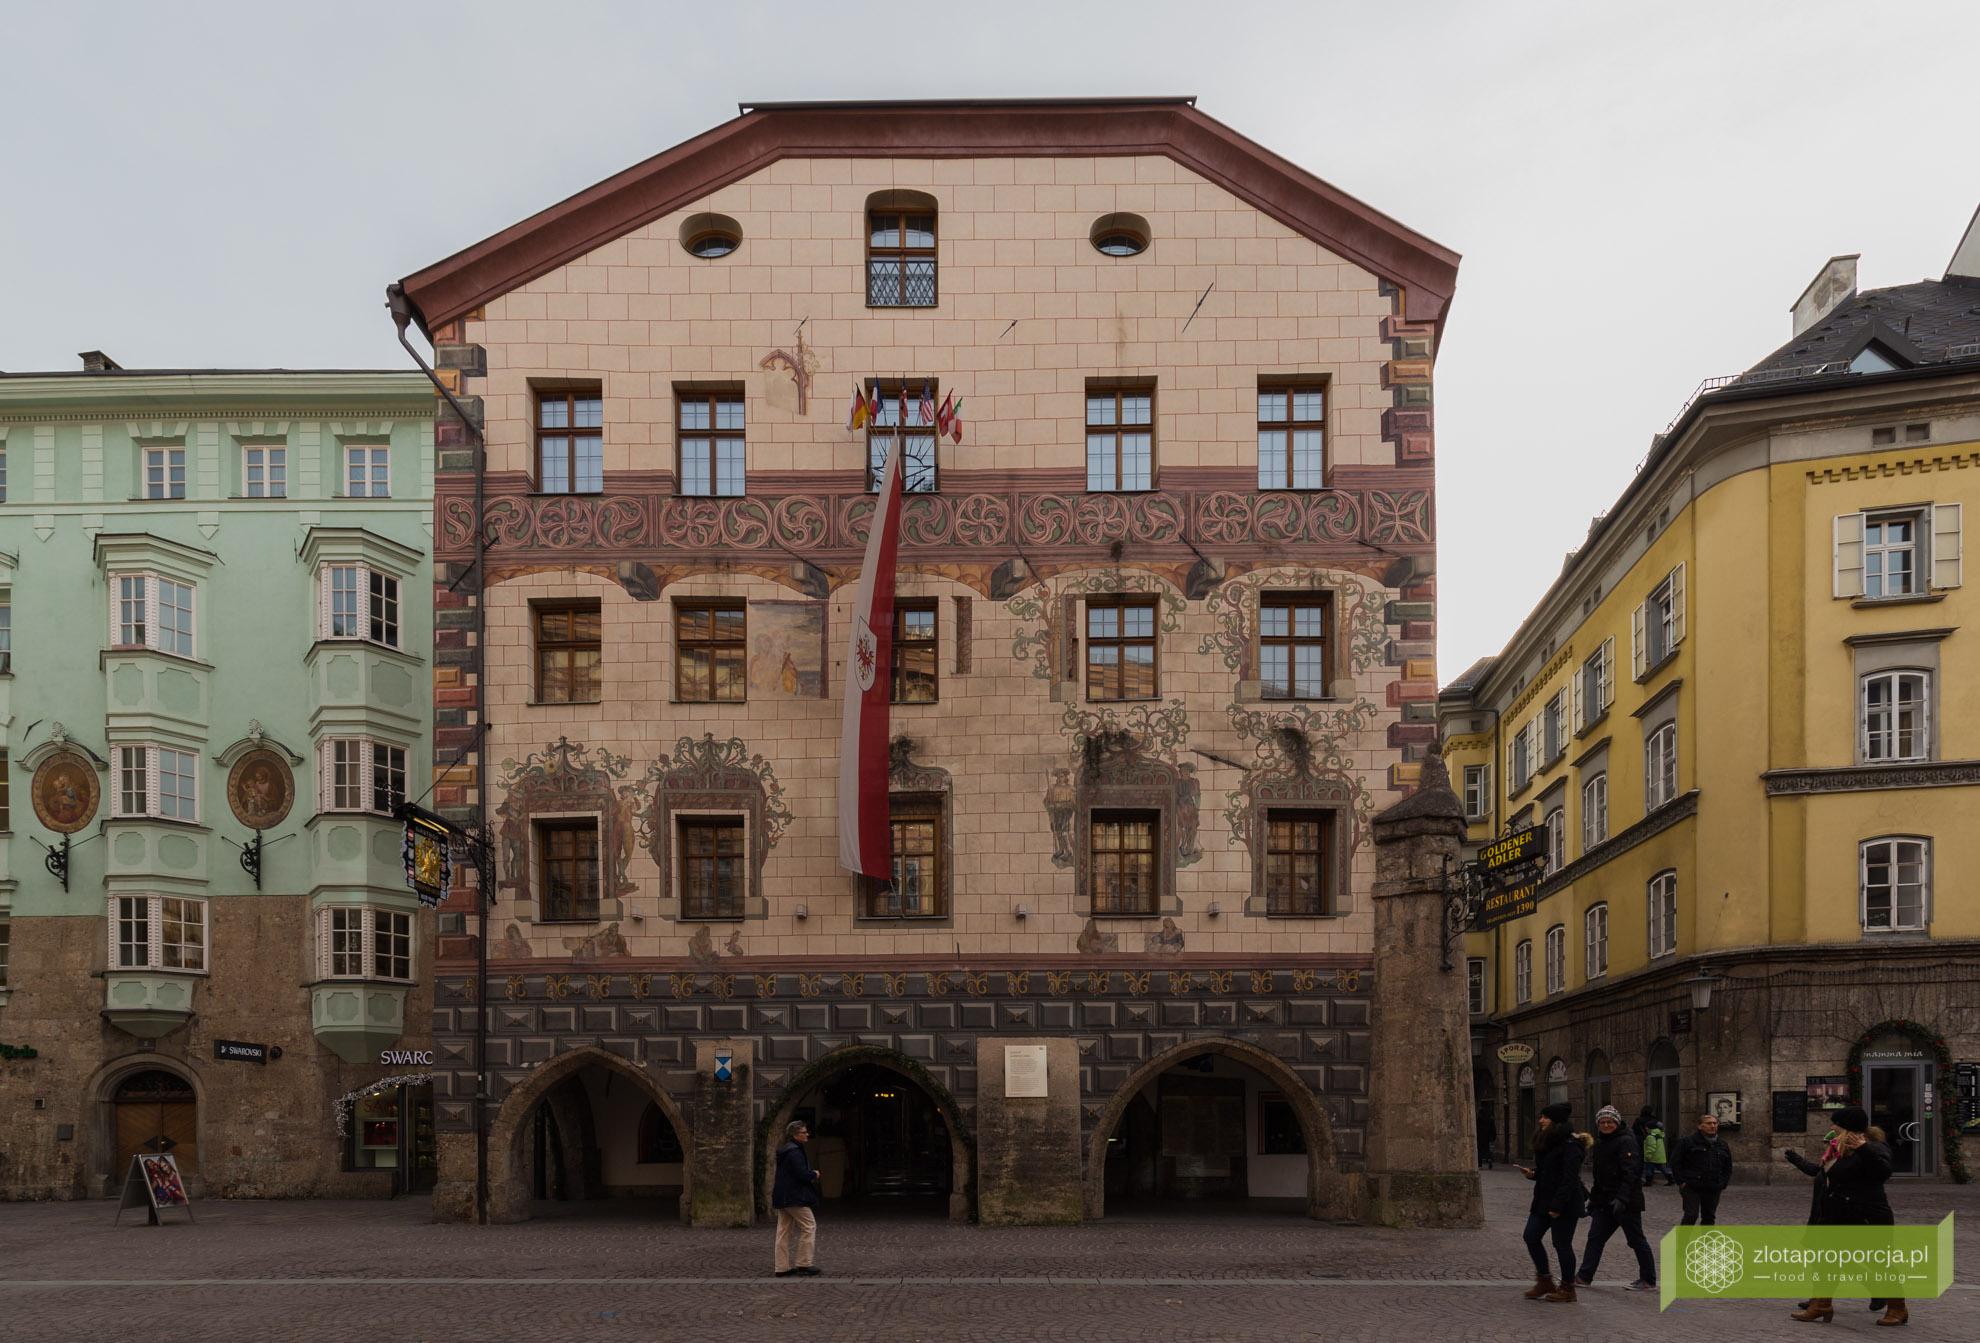 Innsbruck, Tyrol, Austria, starówka w Innsbrucku